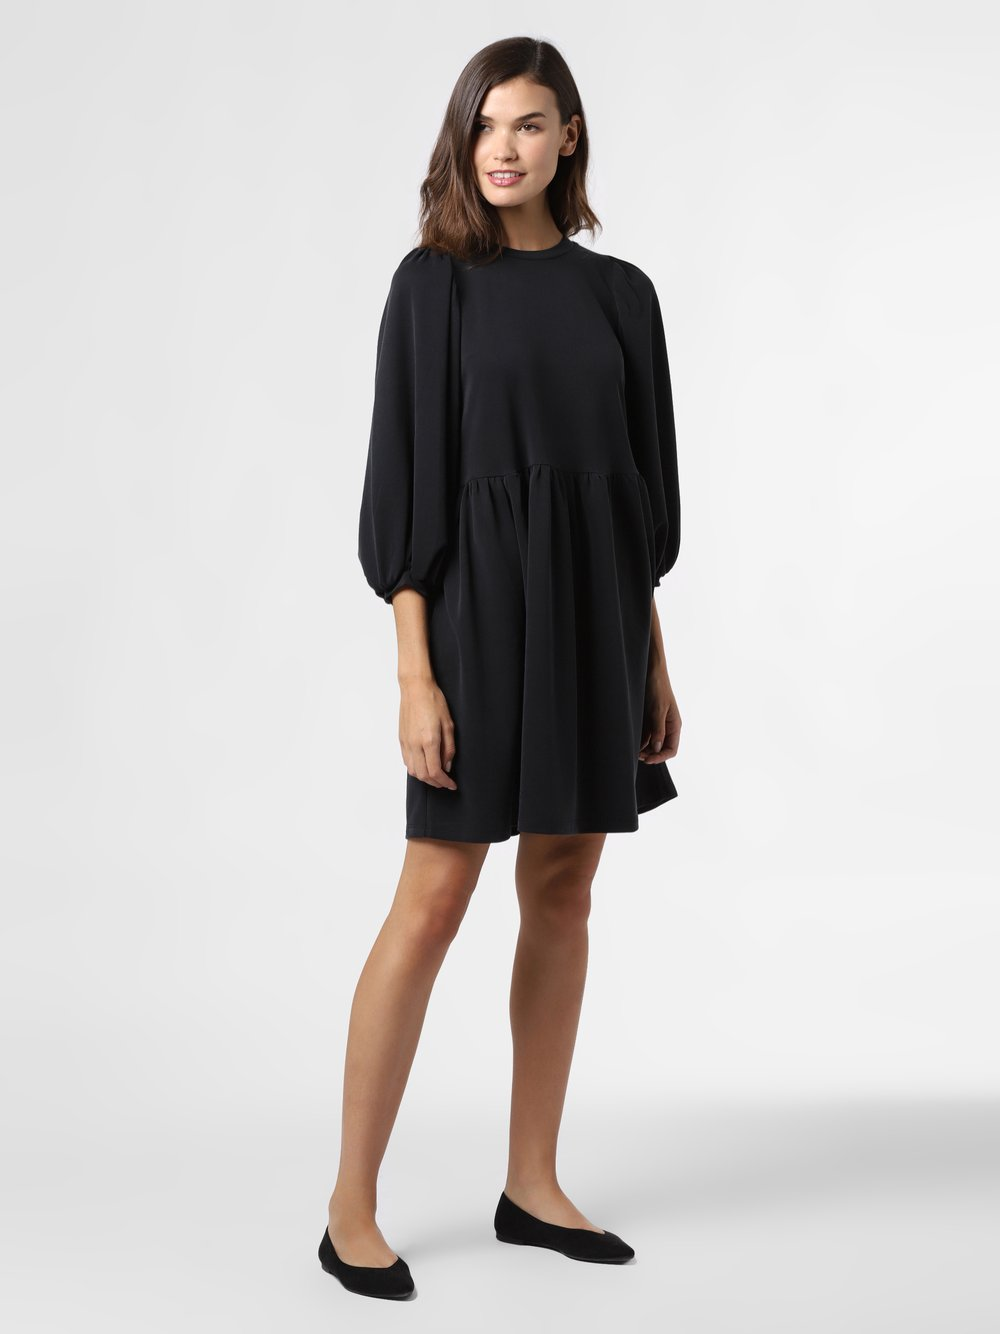 mbyM – Sukienka damska – Gabrielly, czarny Van Graaf 484587-0001-09930